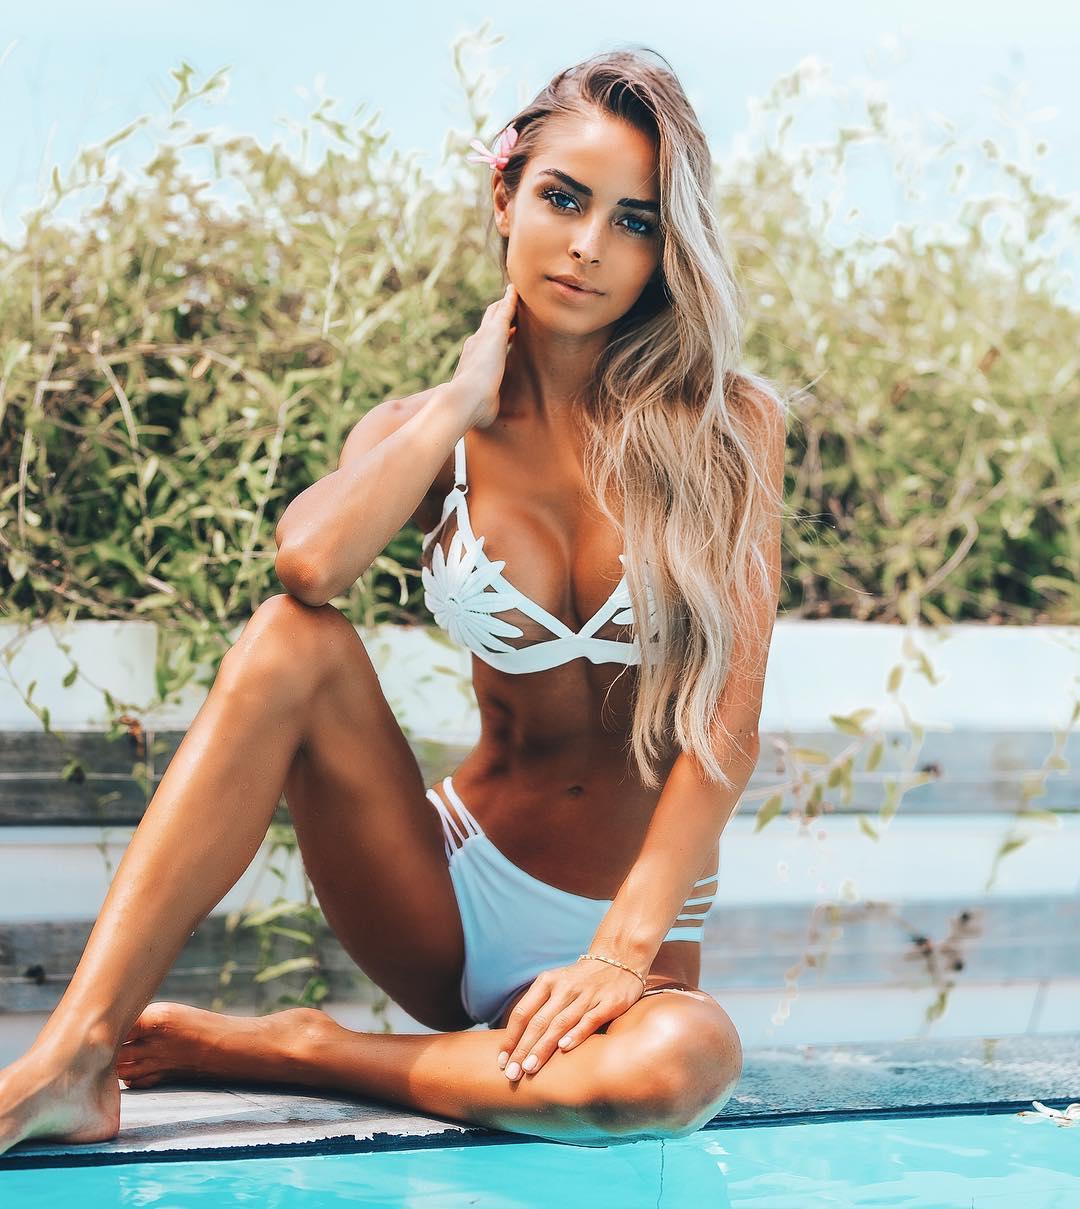 ICloud Chiara Bransi nude photos 2019